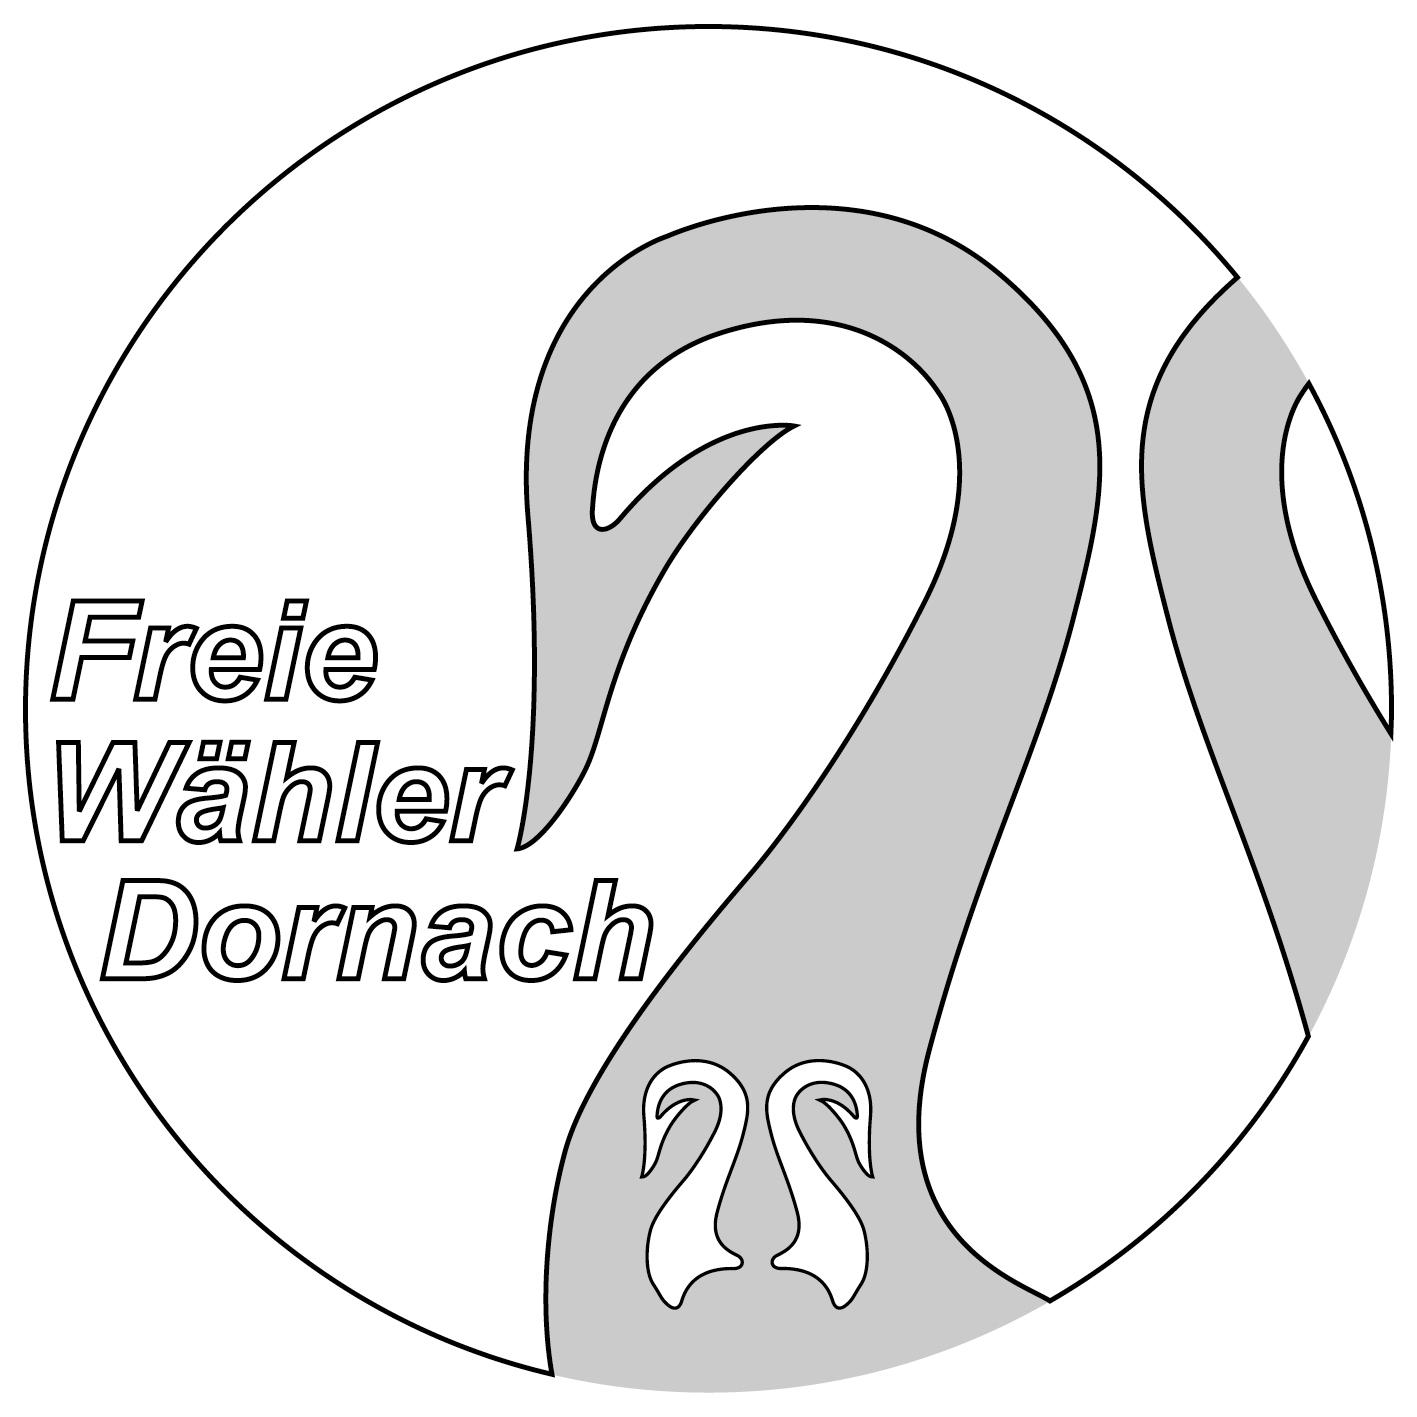 Freie Wähler Dornach